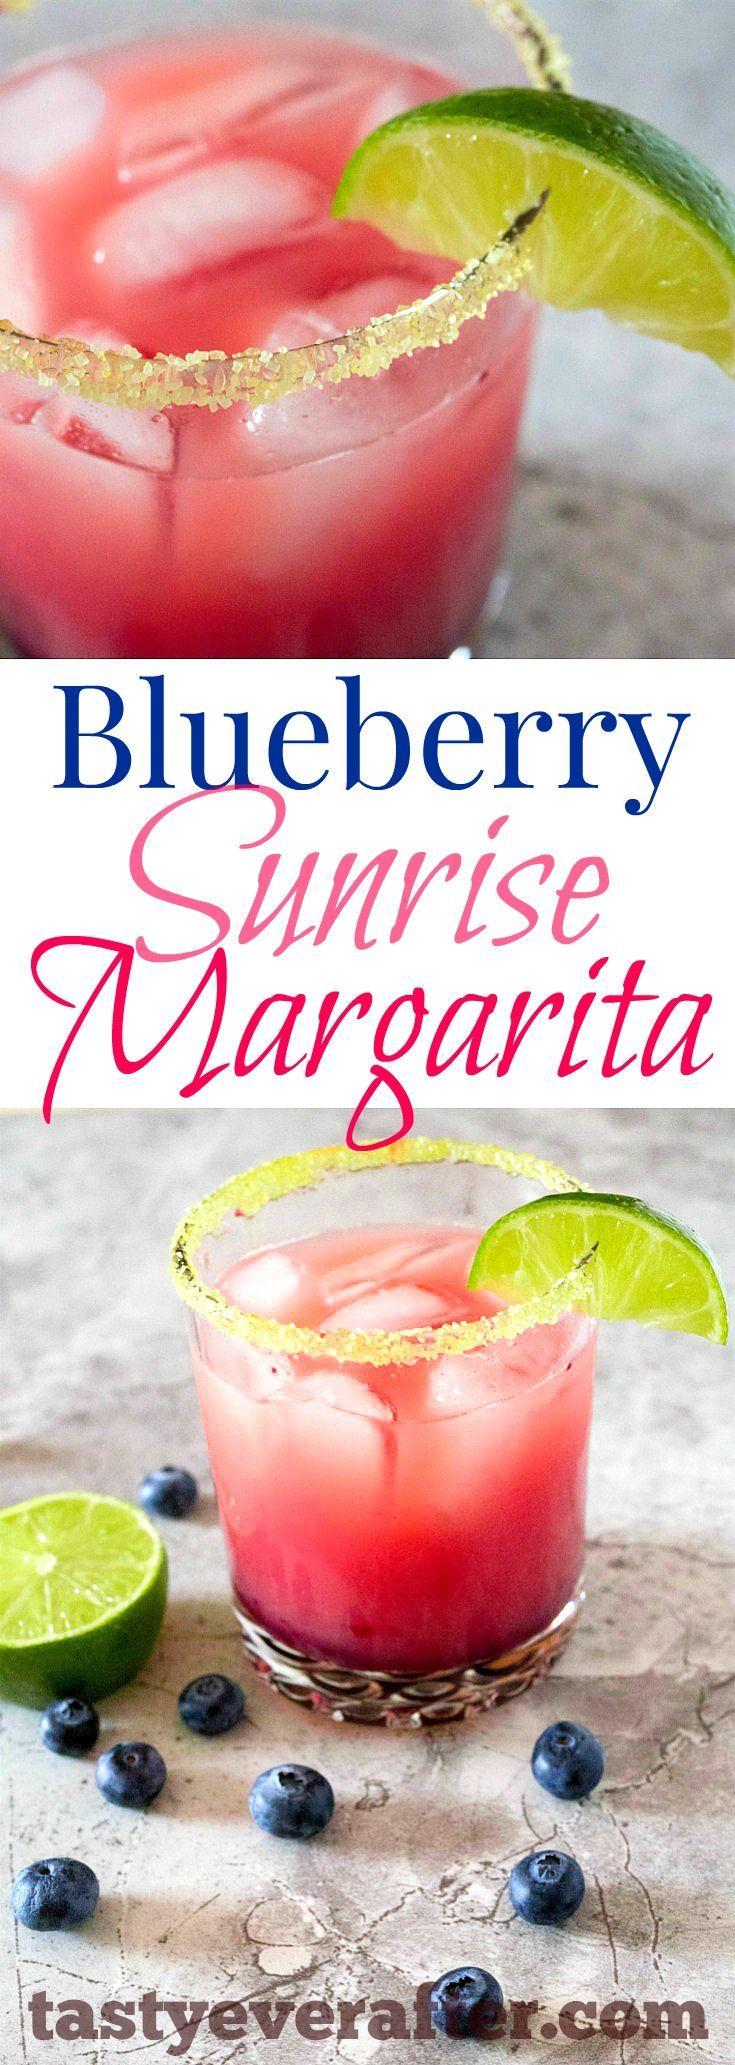 My FAVORITE margarita recipe made with FRESH blueberries!  So easy & refreshing too. #tastyeverafter